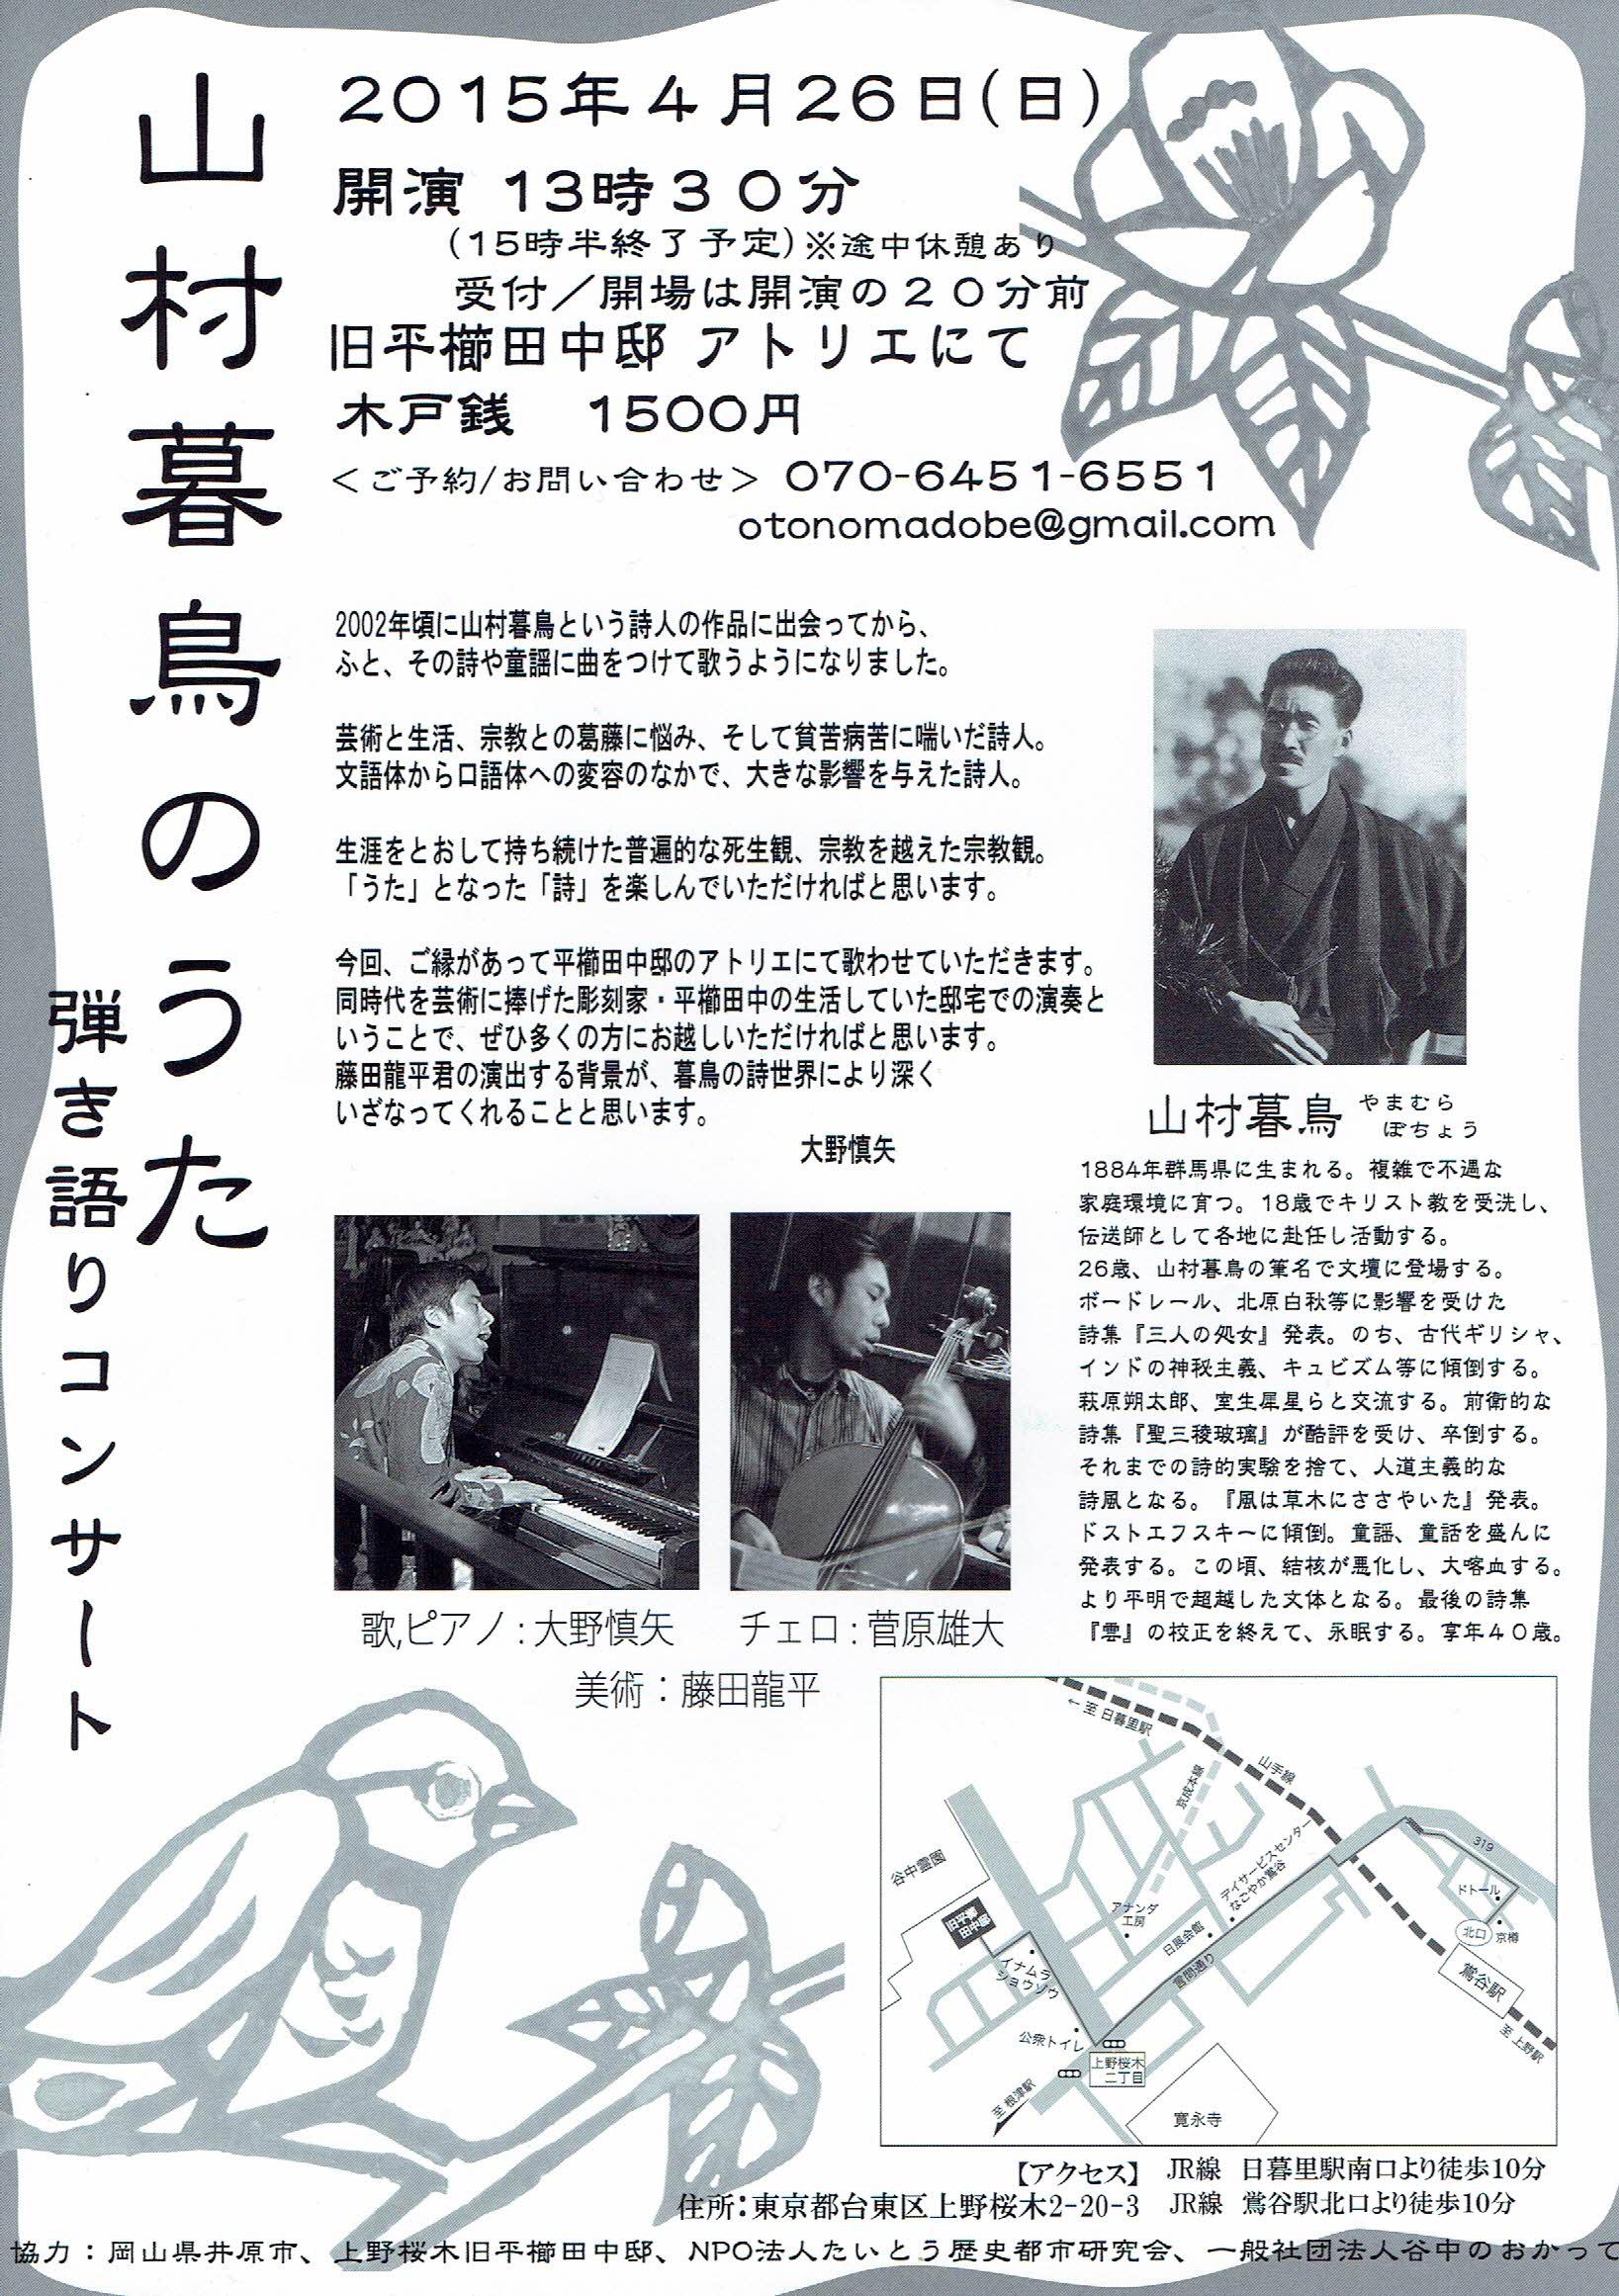 CCF20150405_0001.jpg